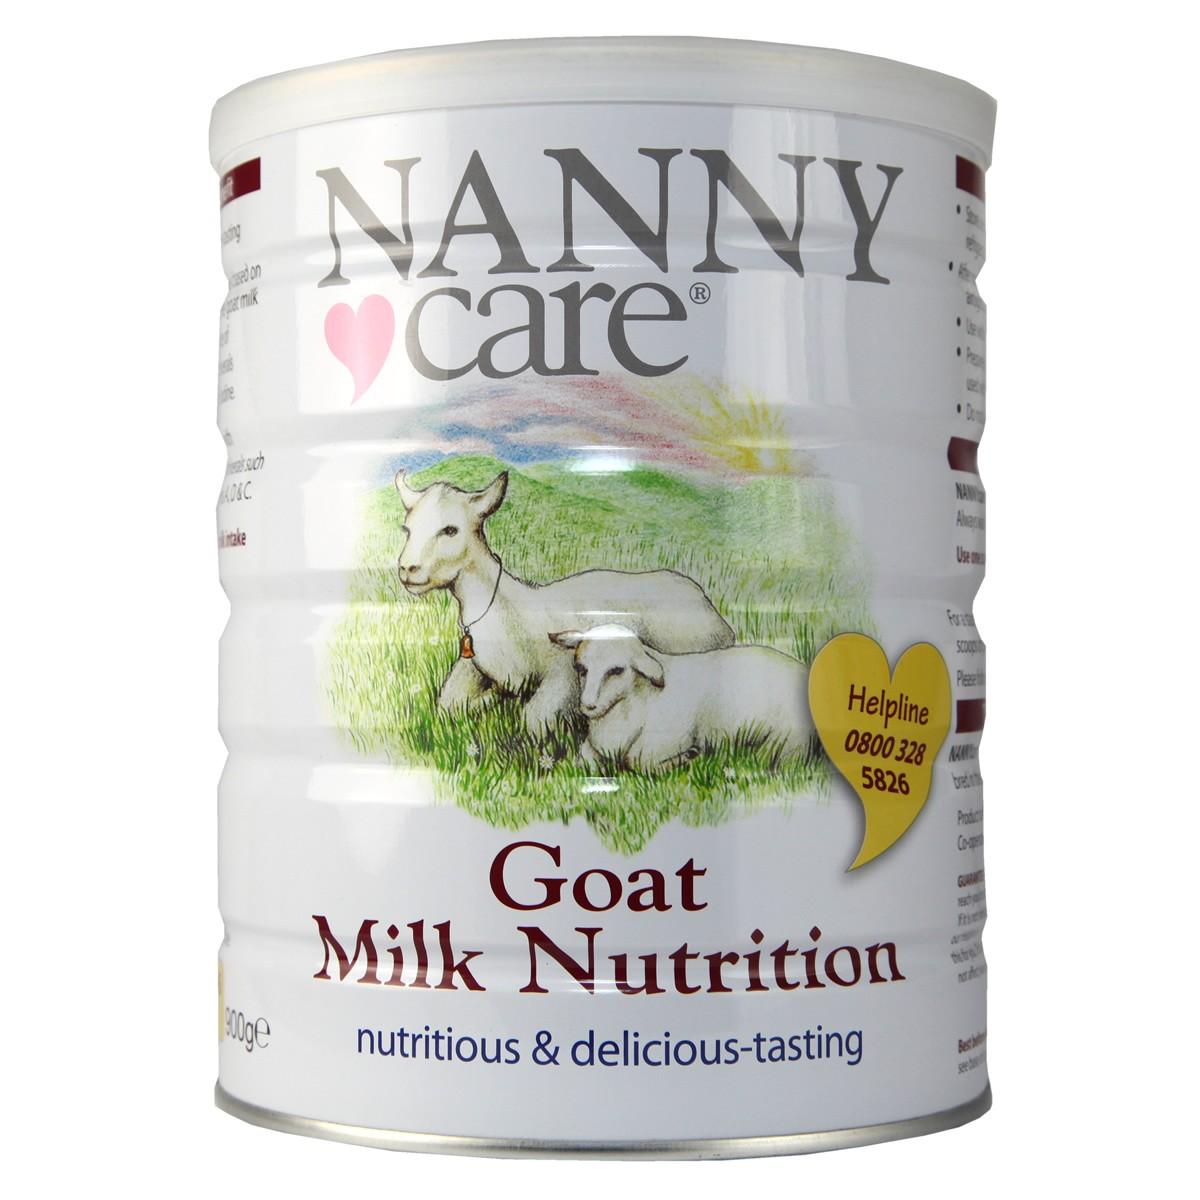 Nanny Care Goat Milk Nutrition